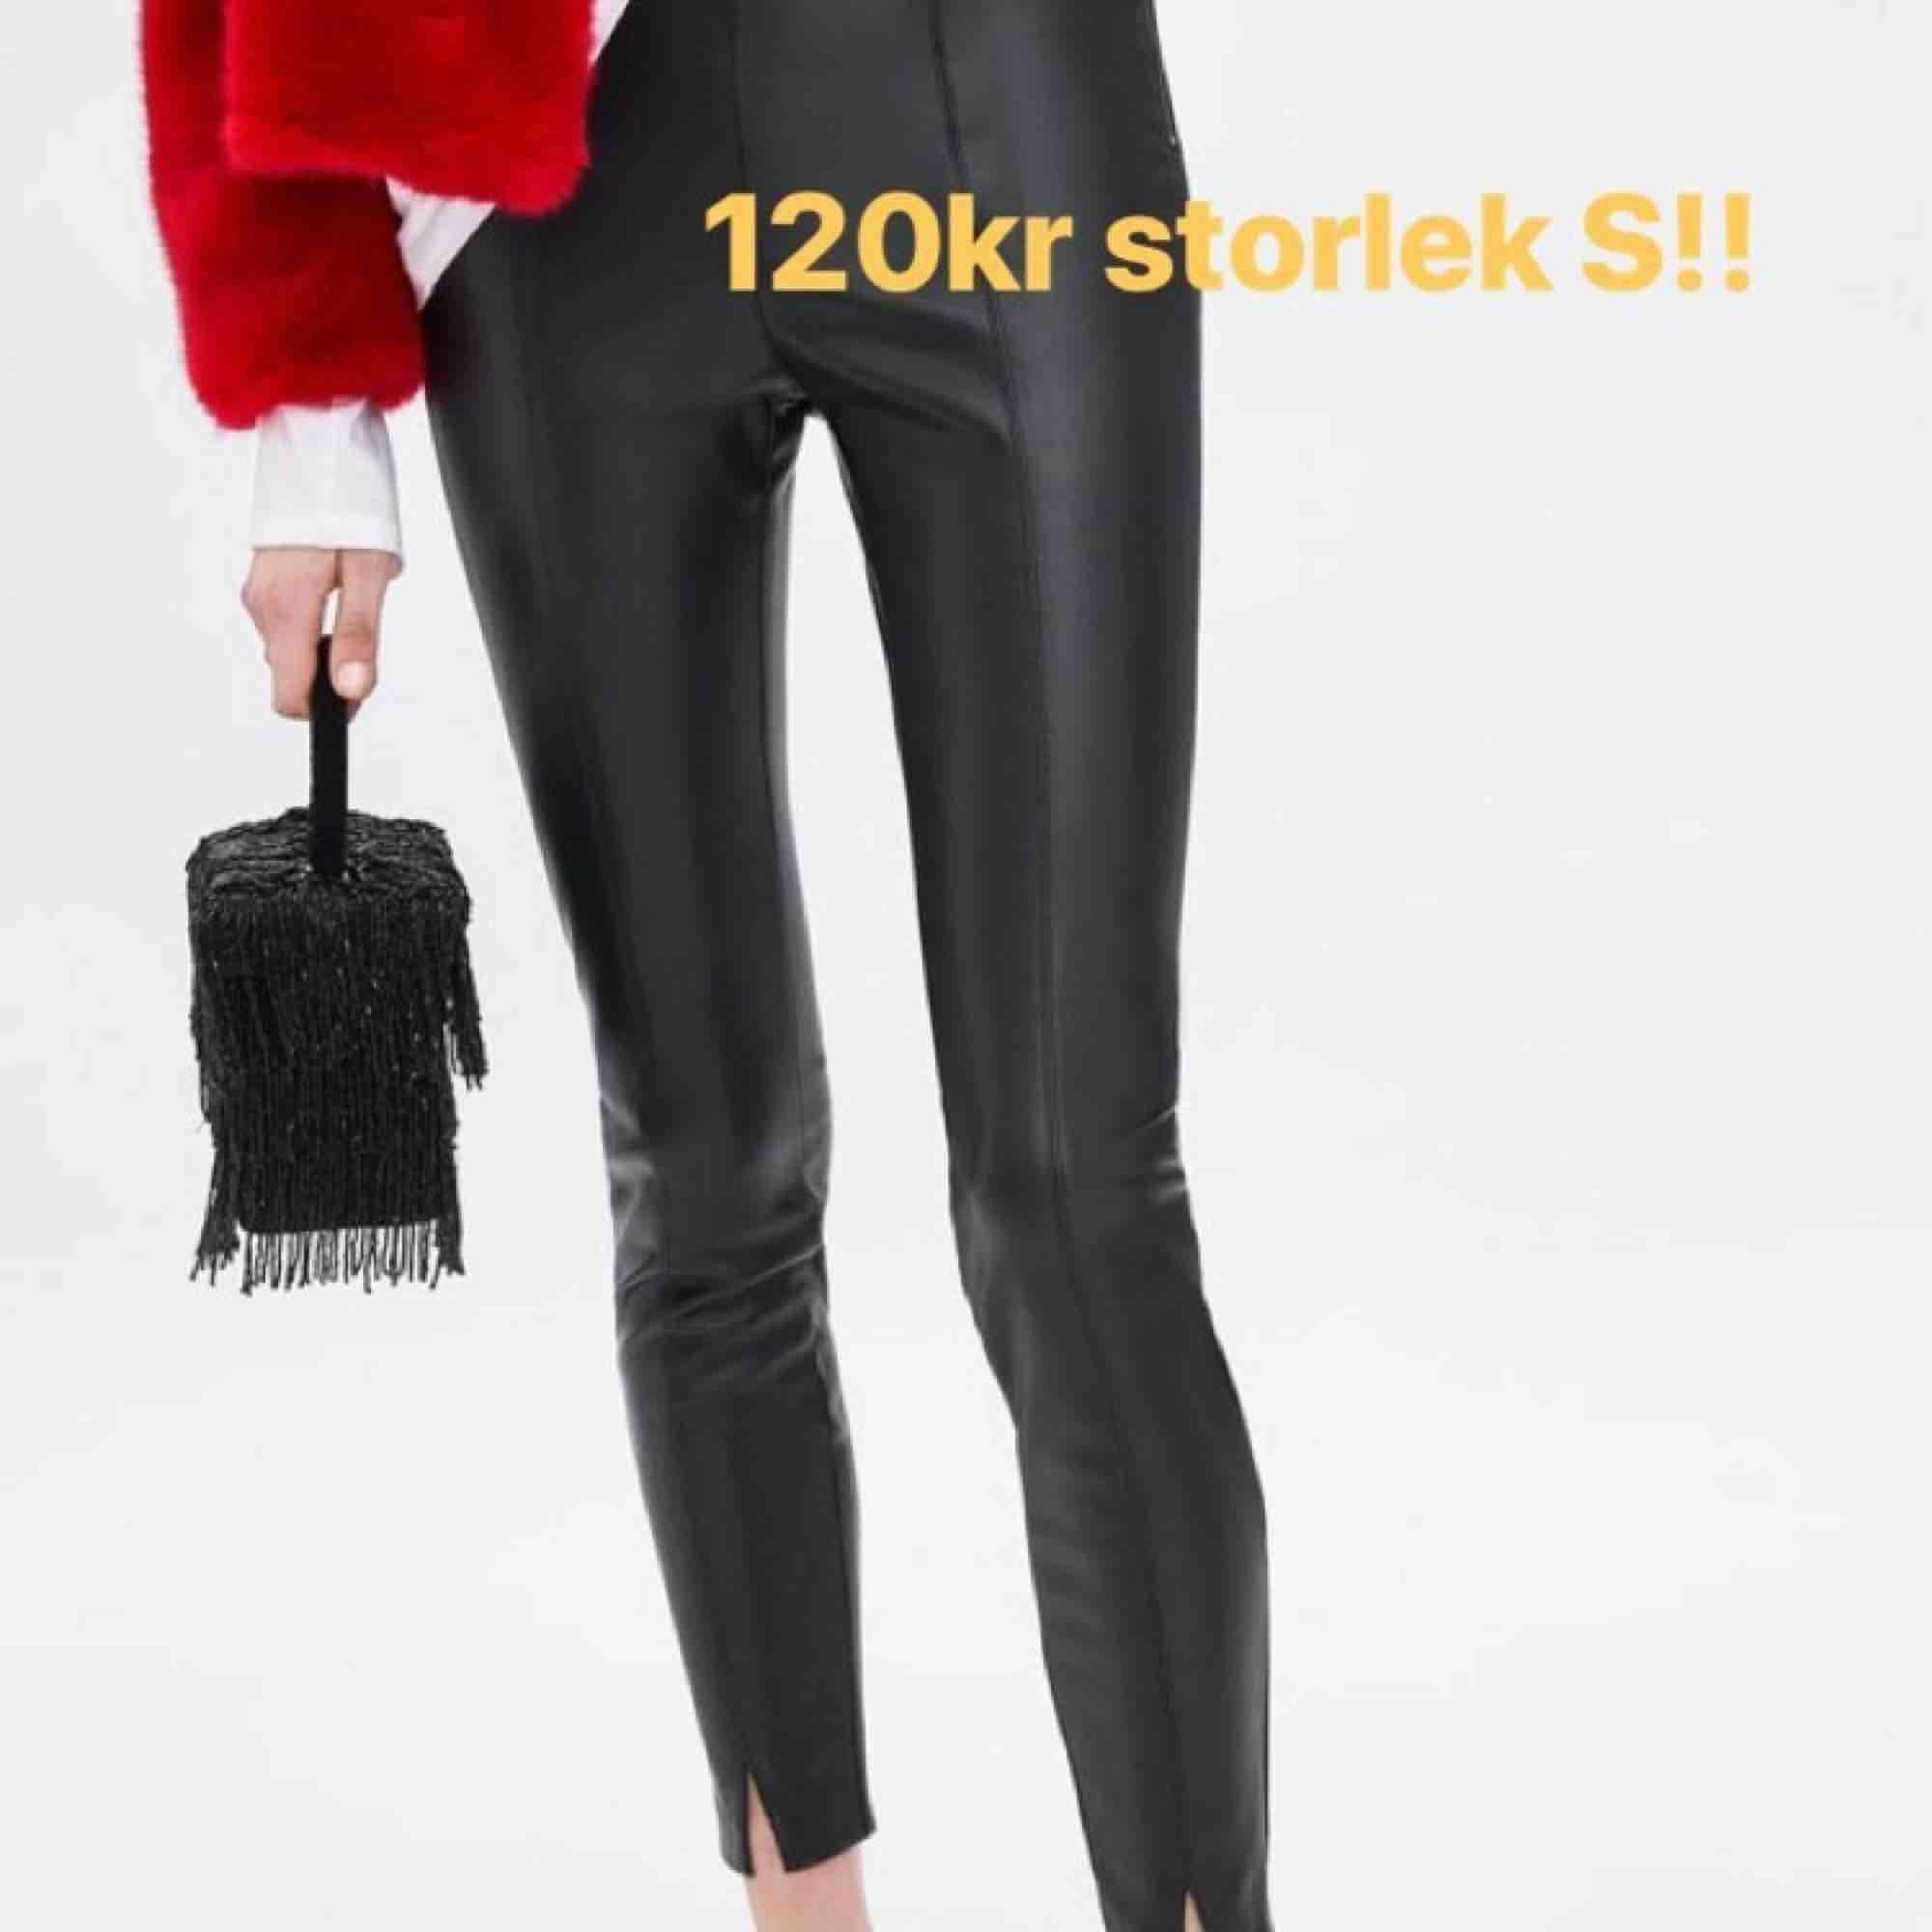 Skinnbyxor från zara storlek S. Jeans & Byxor.